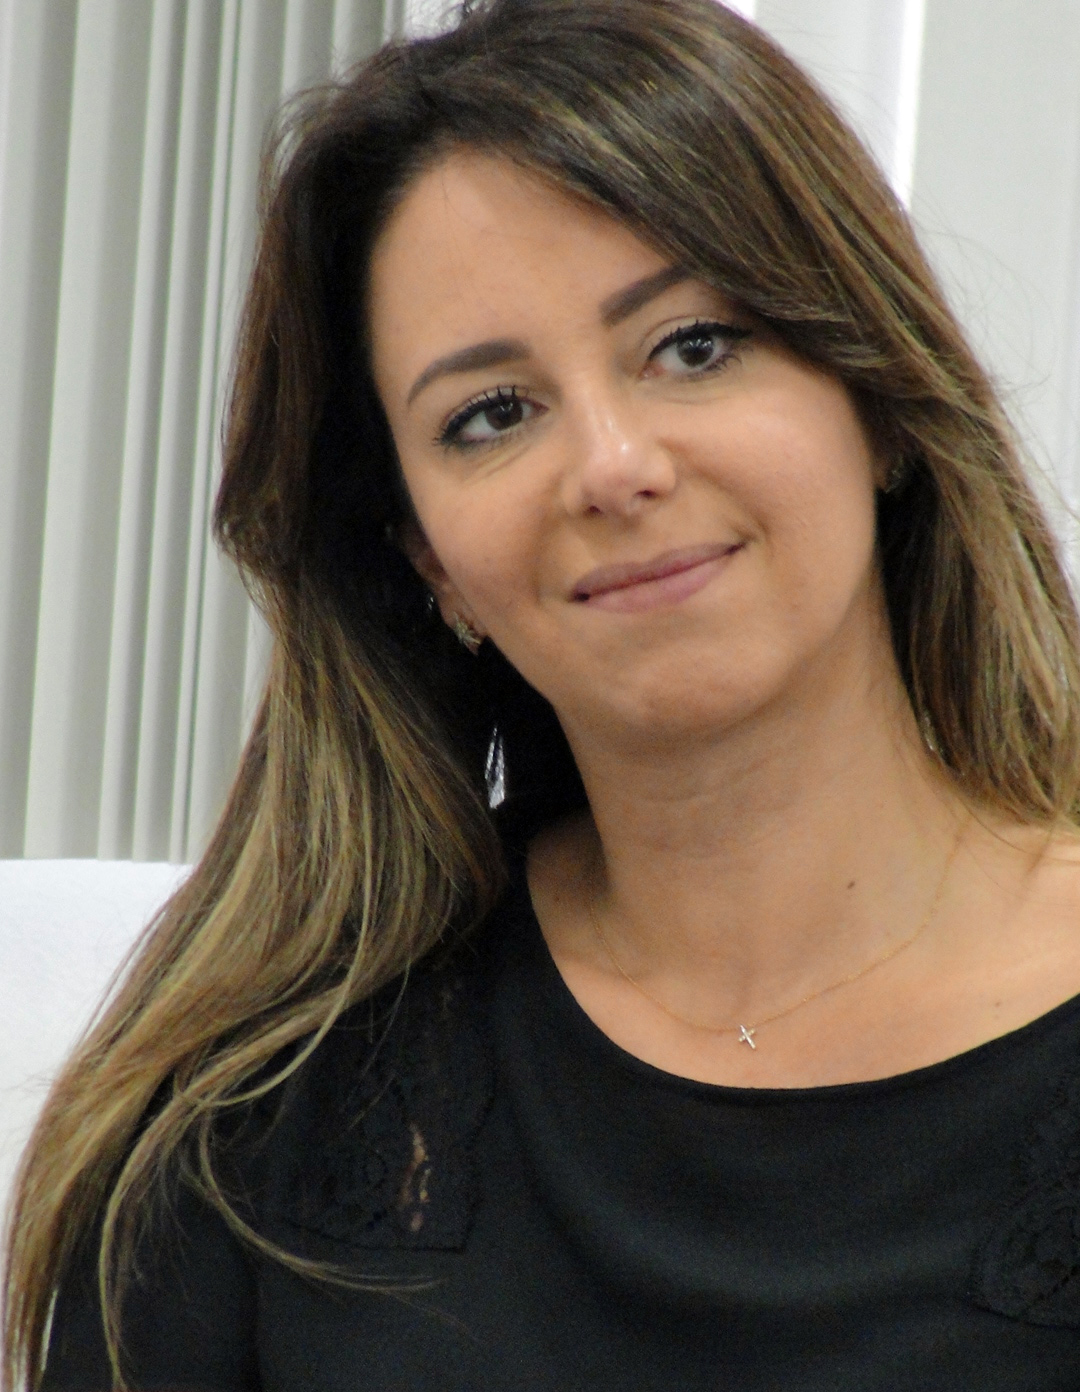 Foto da promotora Silvia Chakian, de Luciana Araújo/Agência Patrícia Galvão